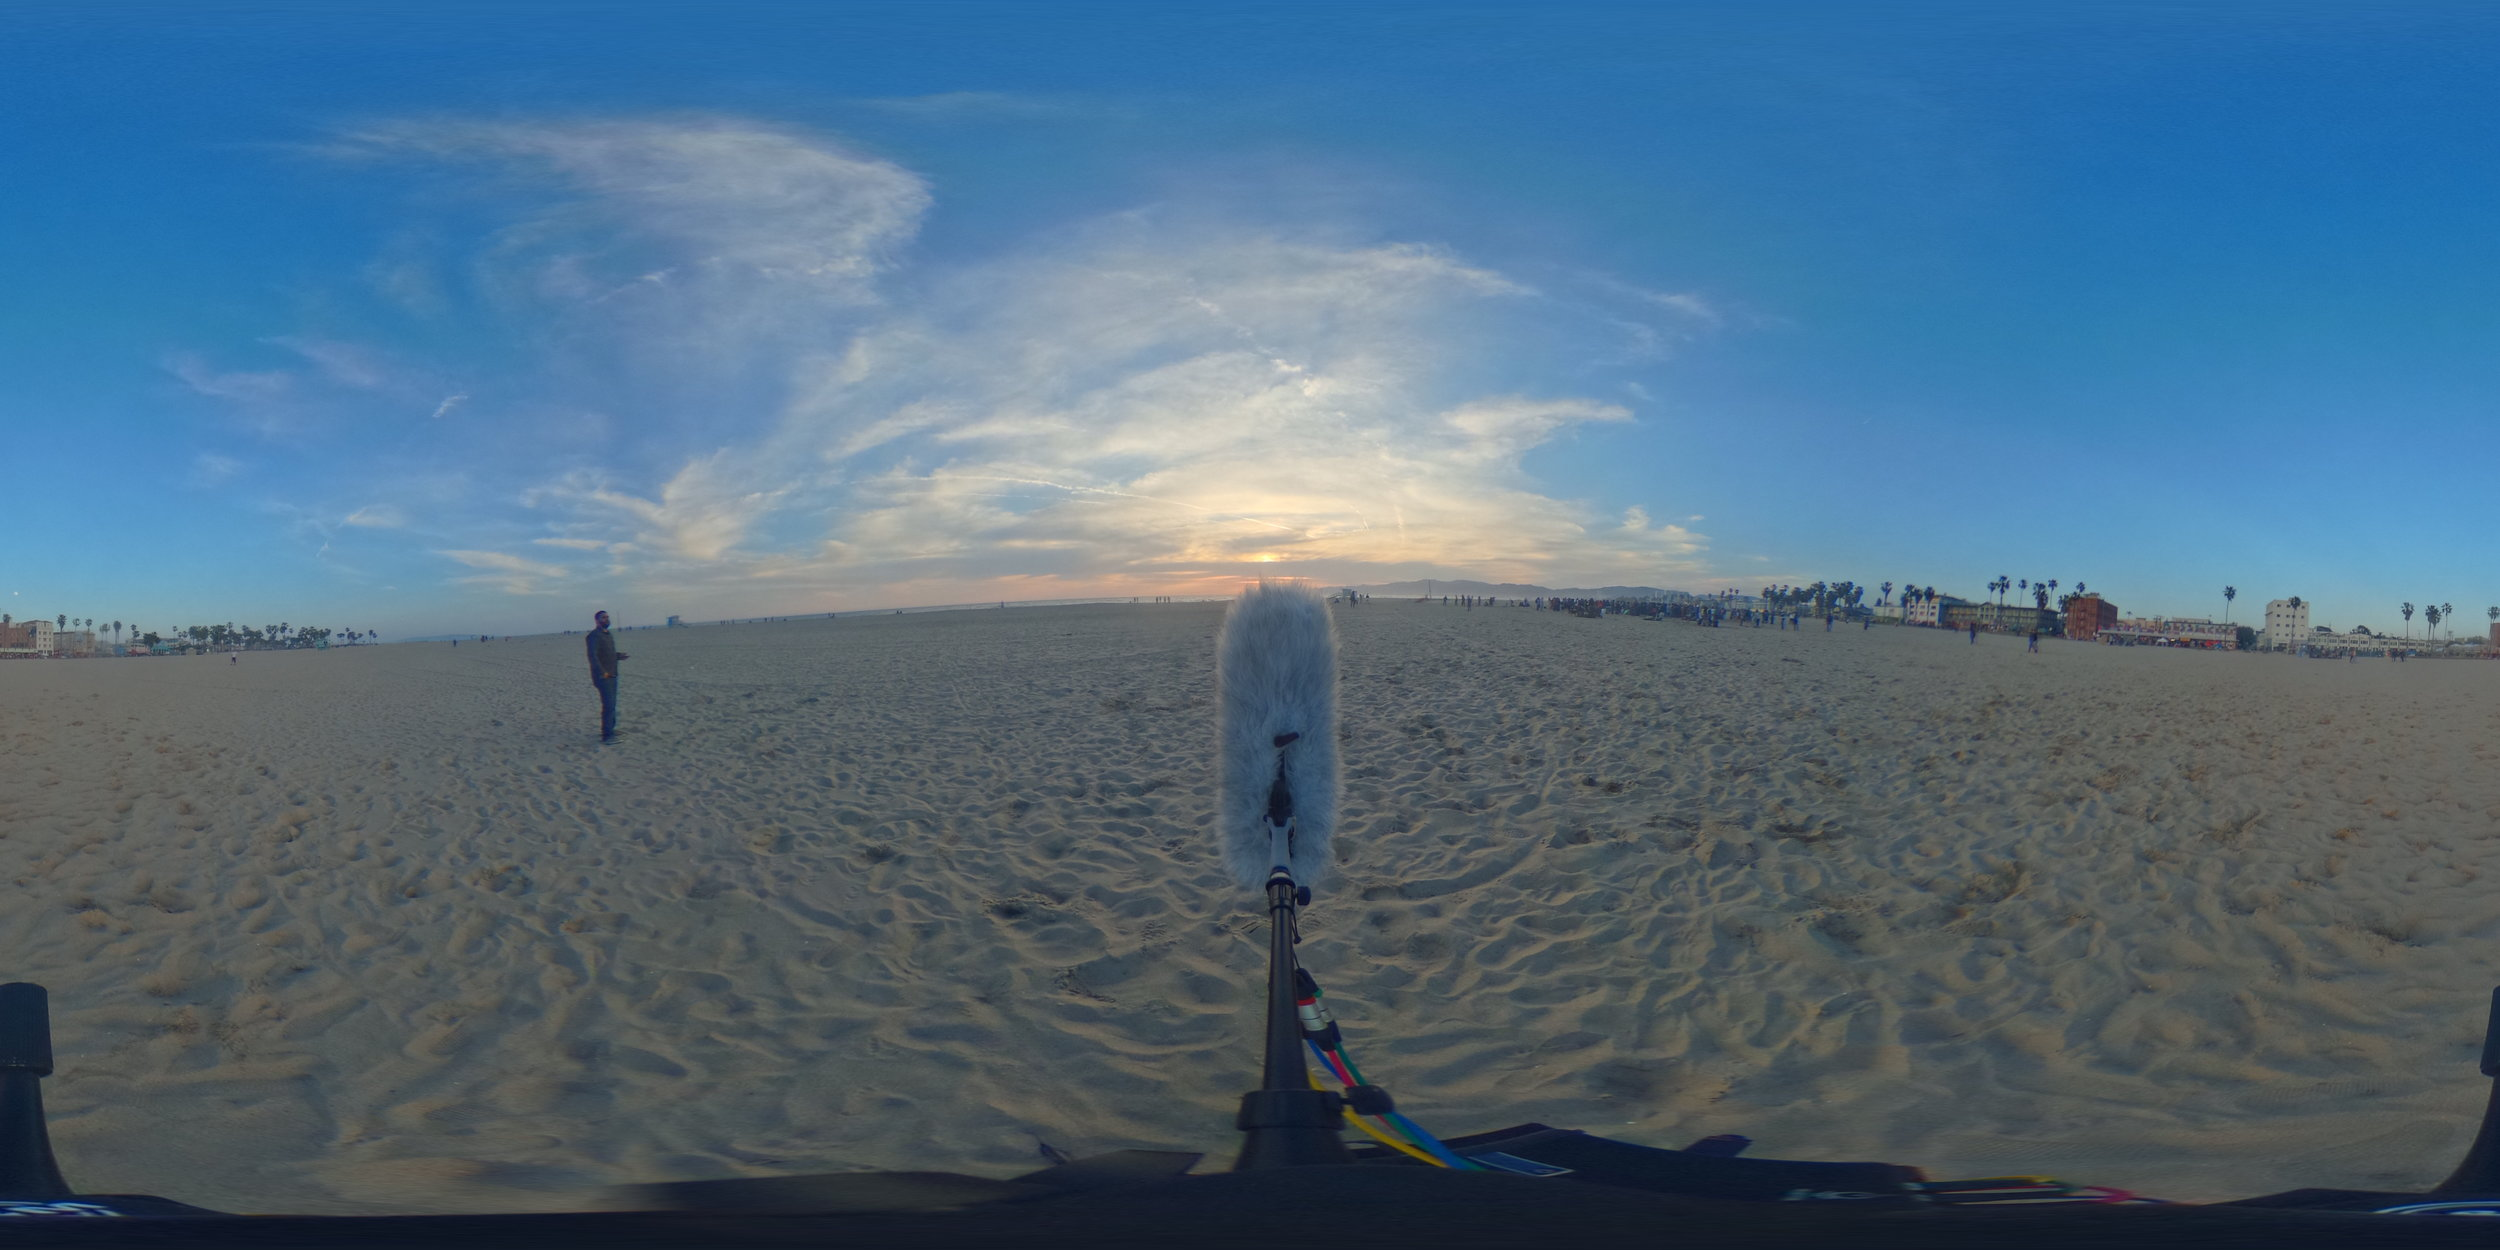 EXT_Day_Beach_MediumDistanceDrumCircle_MediumCrowd_DistantWaves_JPEG.JPG